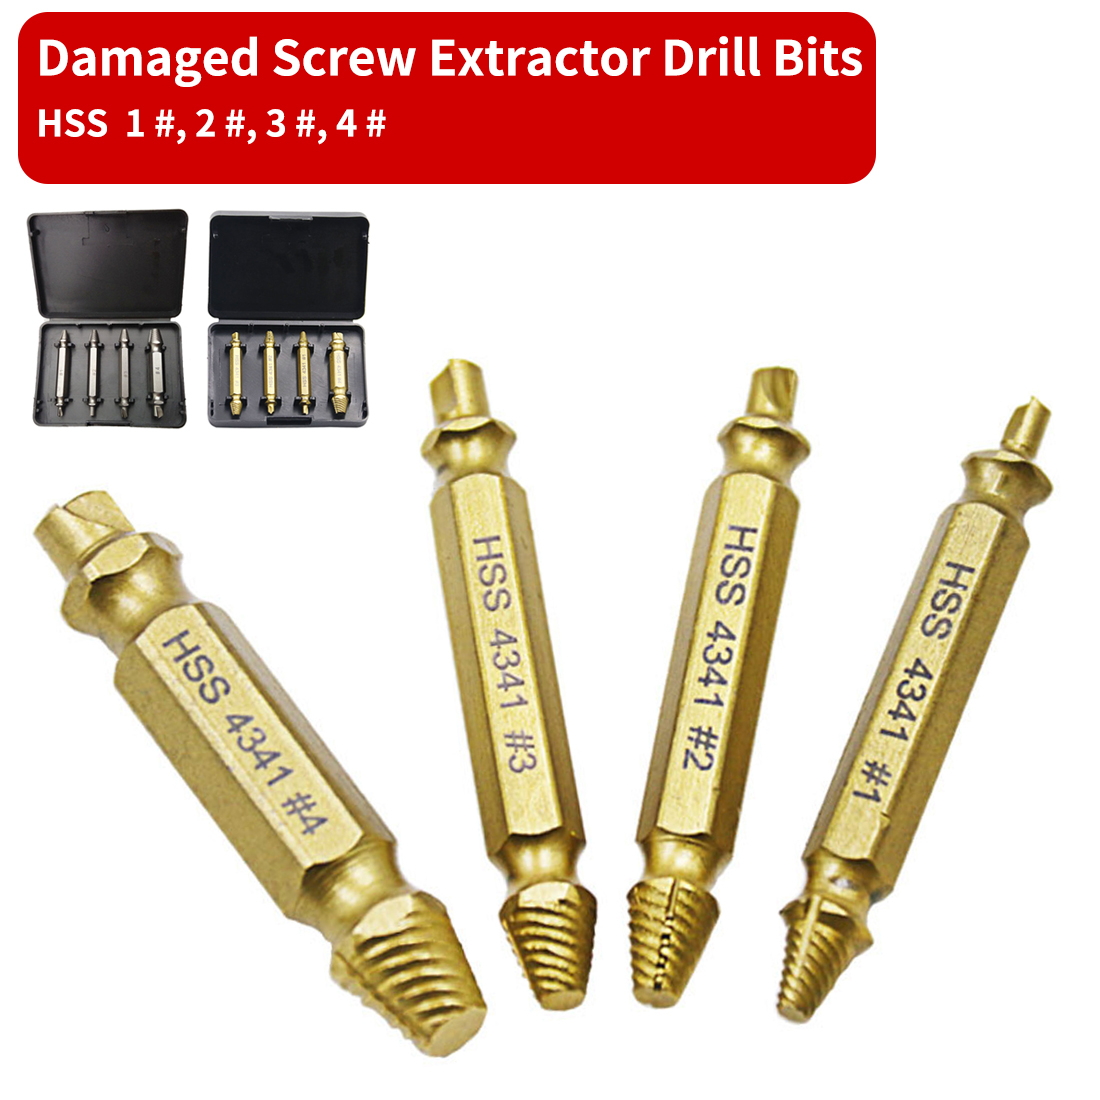 4pcs 1# 2# 3# 4#  Screw Extractor Broken Damaged Screw Extractor Drill Bit Guide Set Broken Bolt Fastener Remover HSS